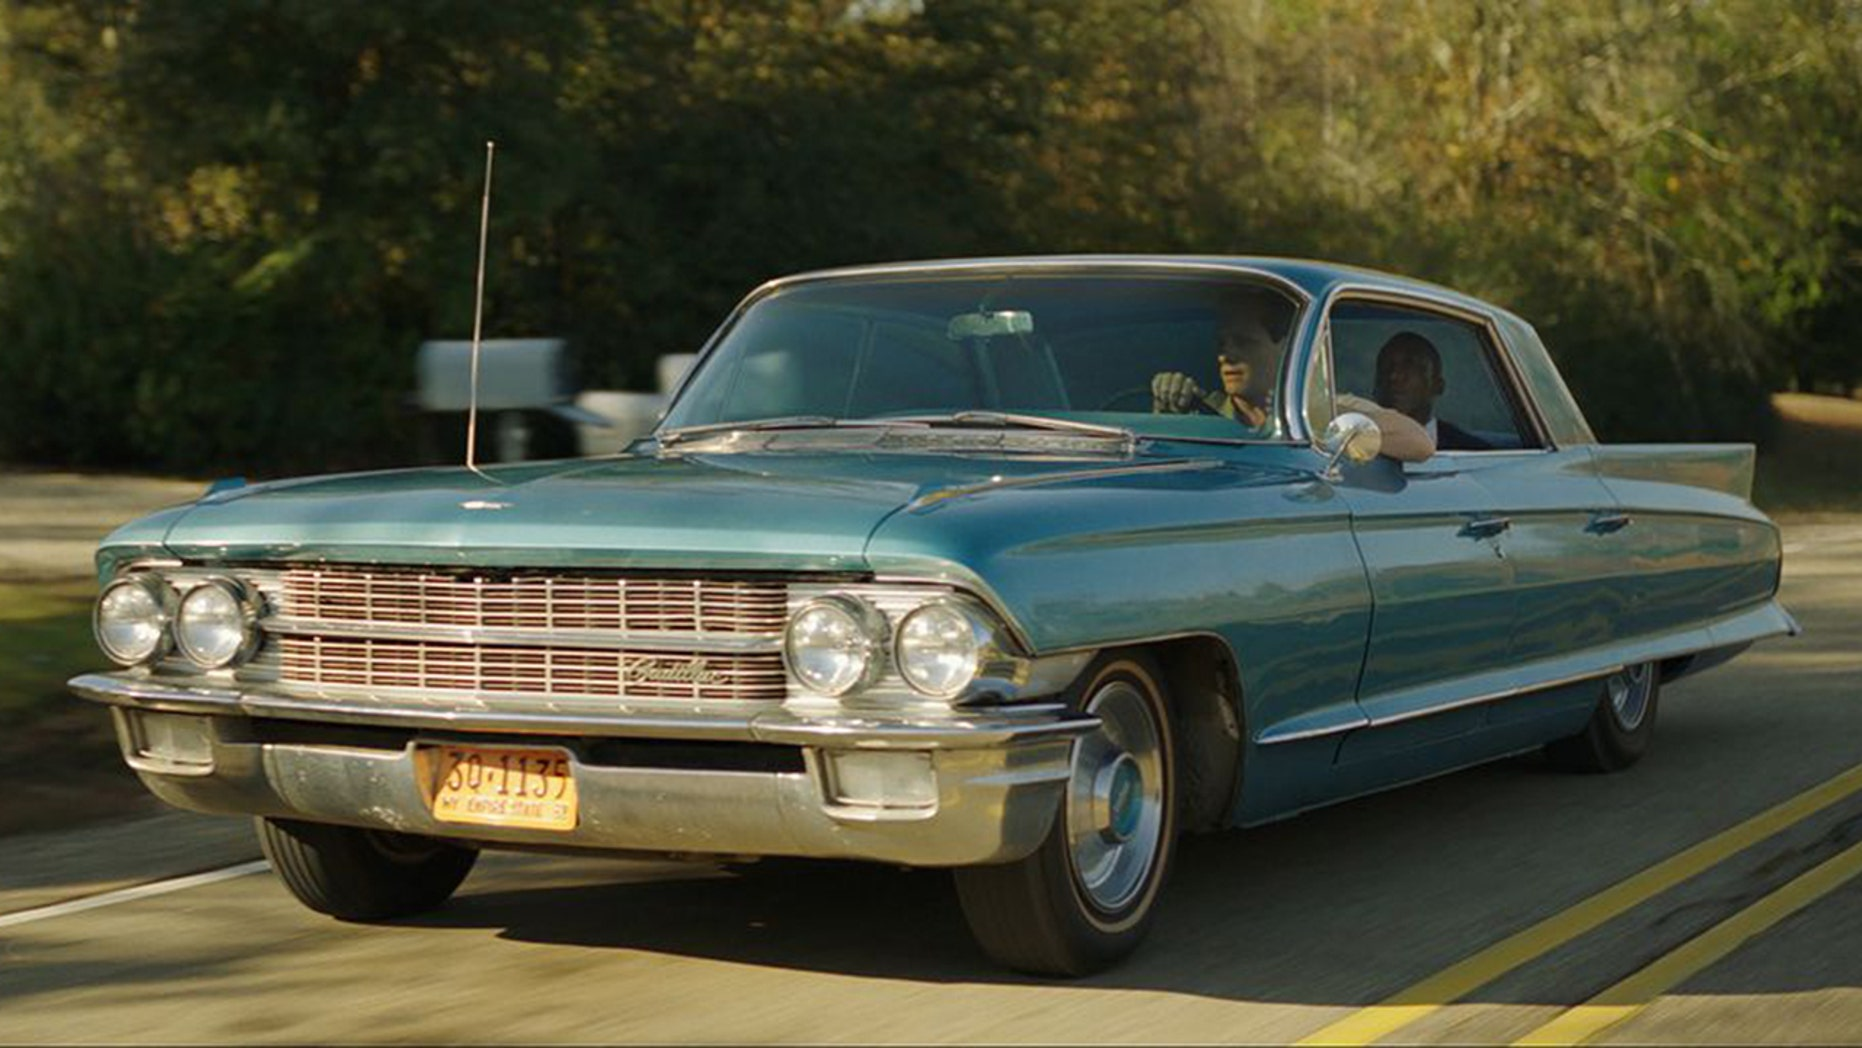 'Green Book' Cadillac DeVille